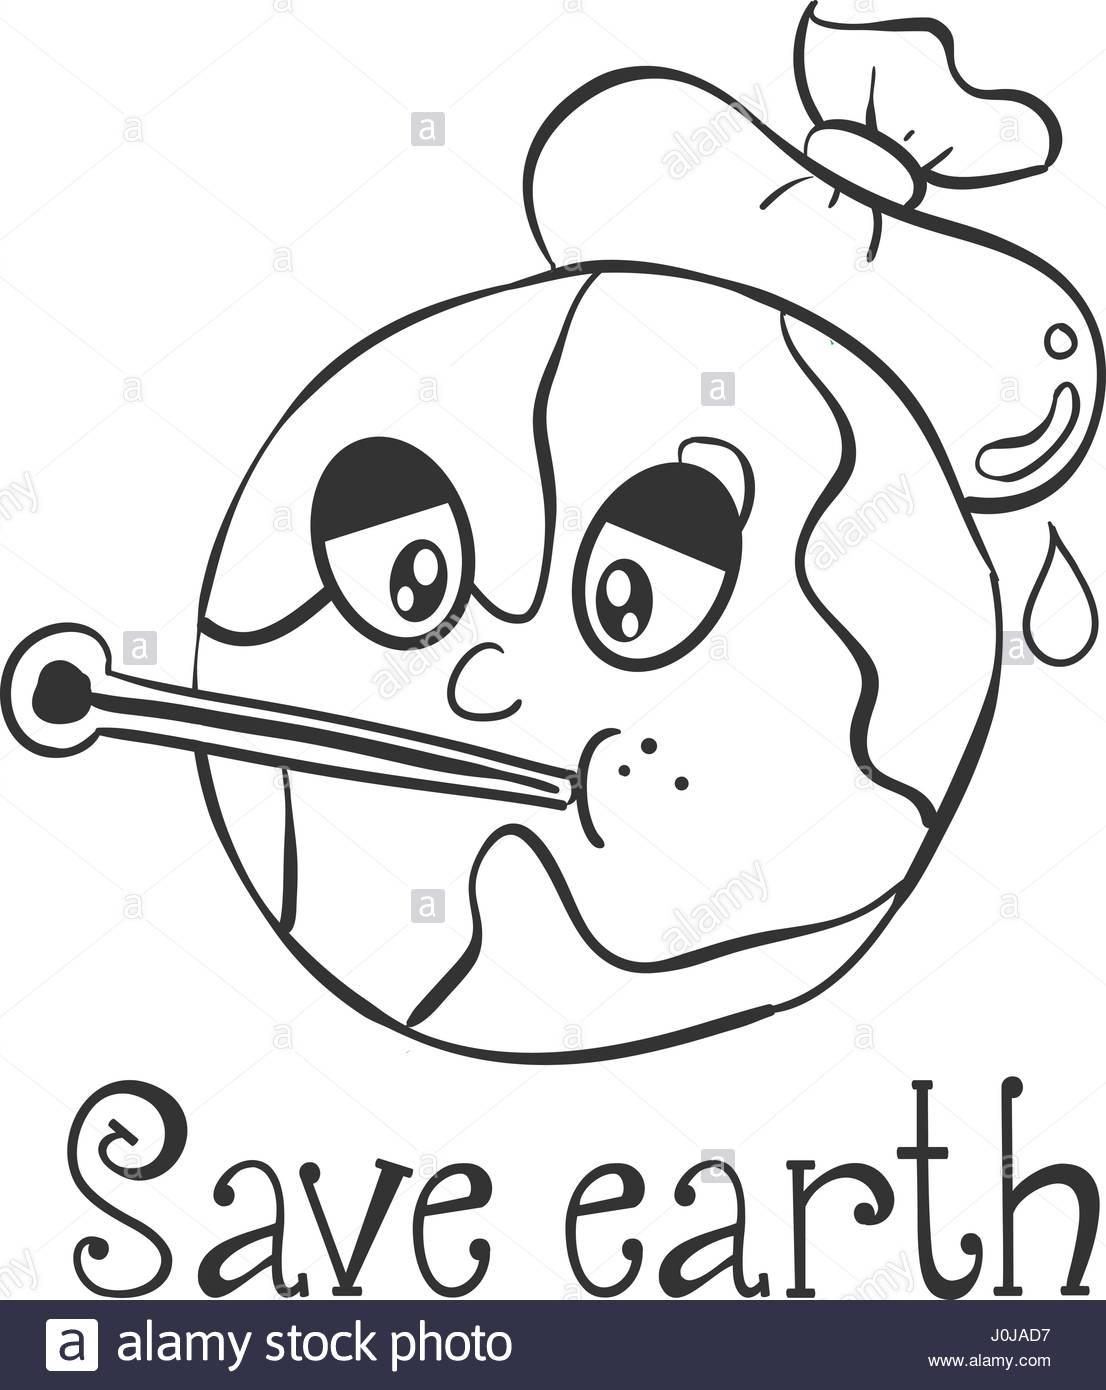 1106x1390 Hand Draw Save Earth Design Stock Vector Art Amp Illustration